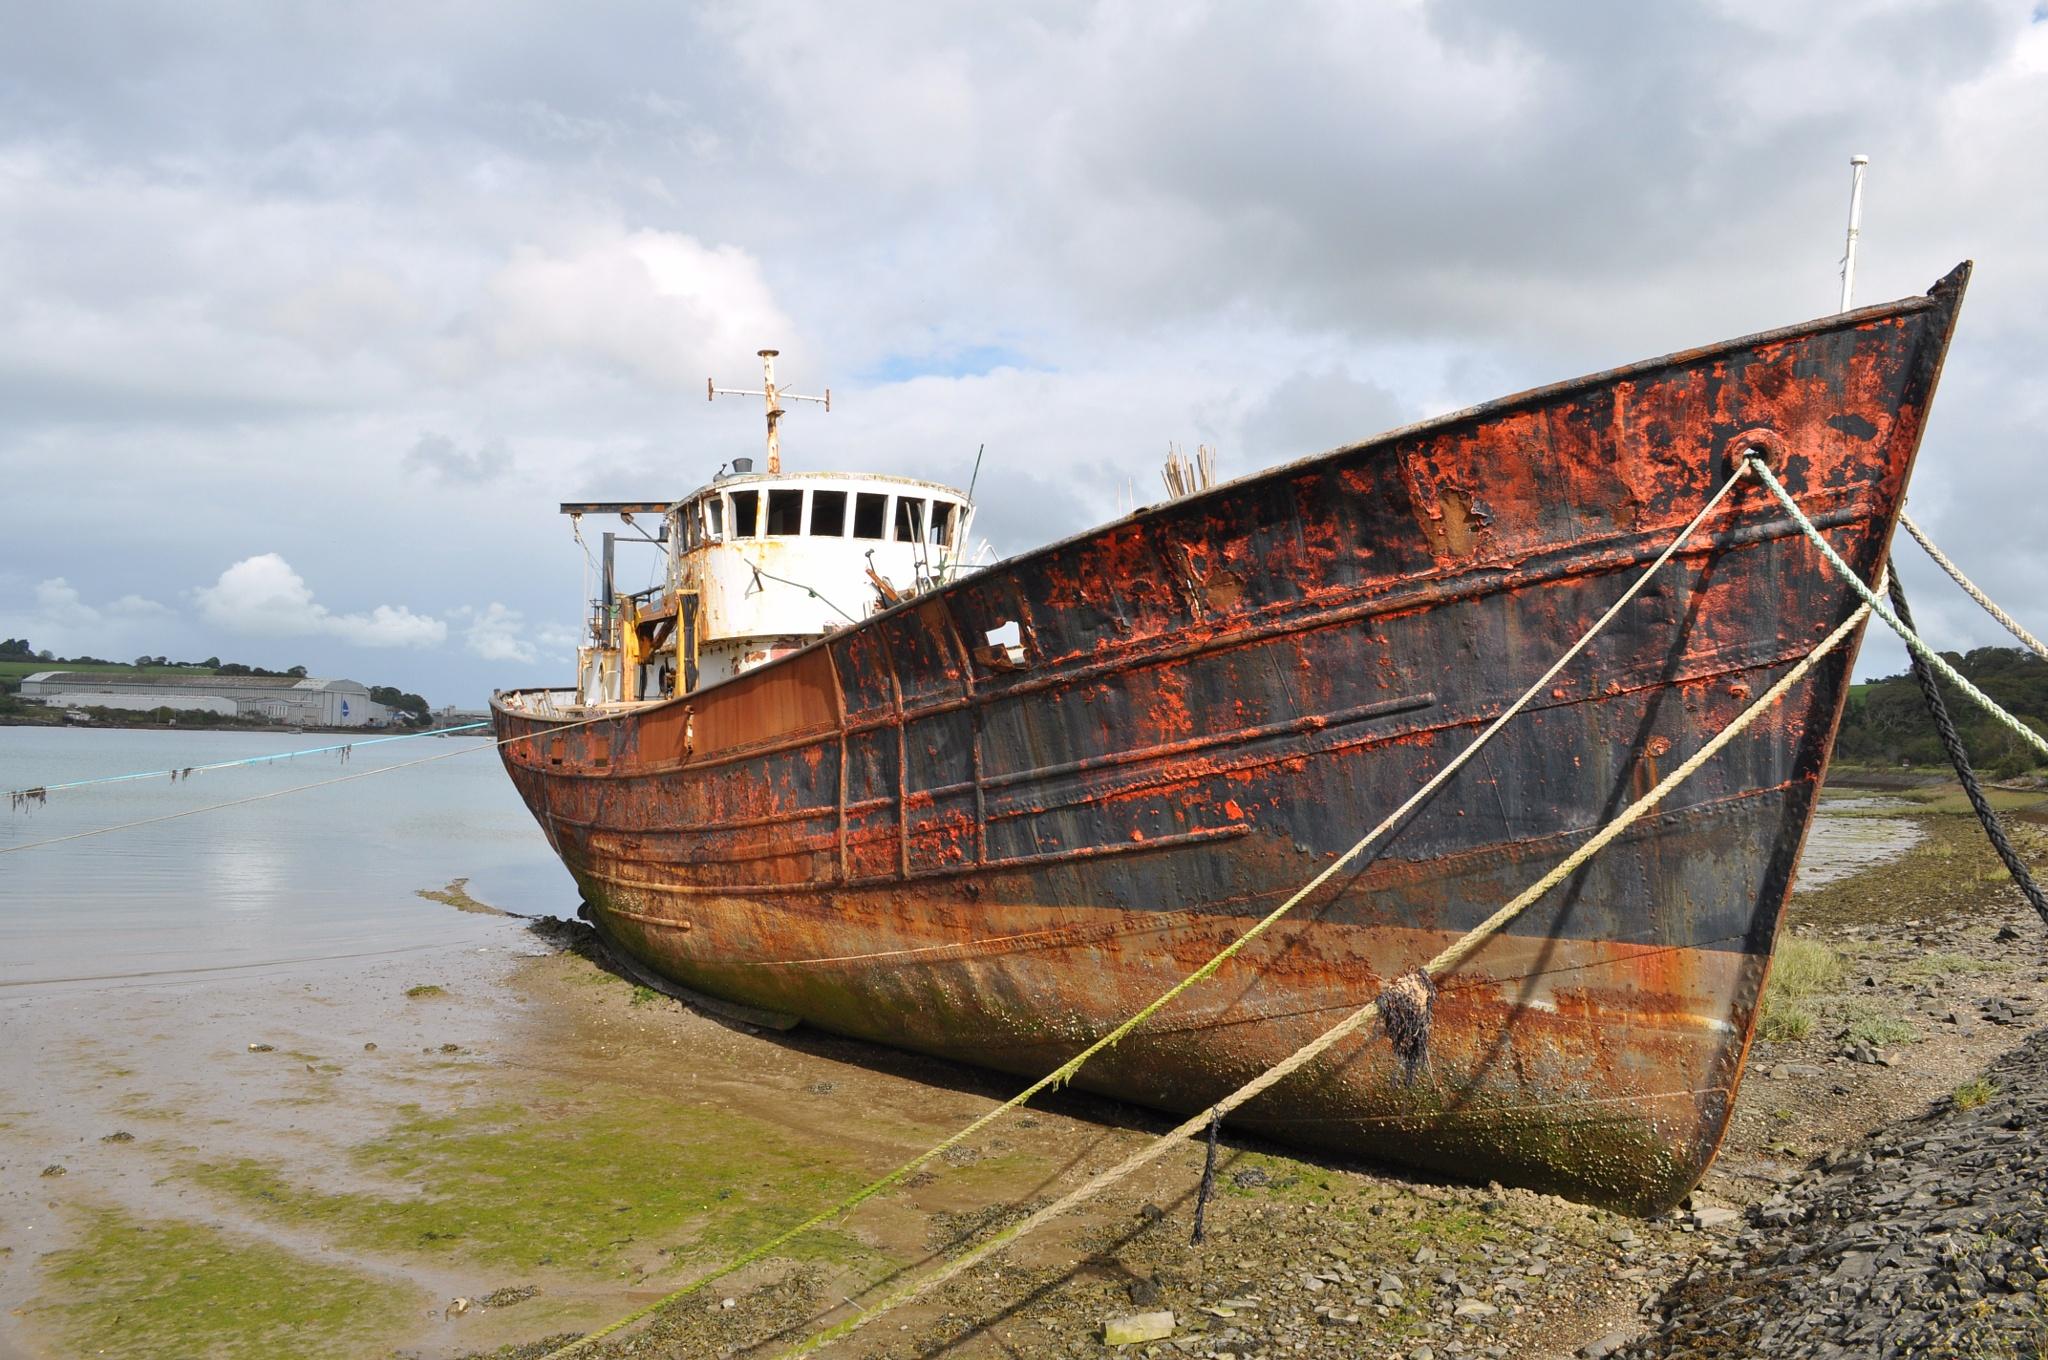 Estranged in an estuary 2 by RobJames66